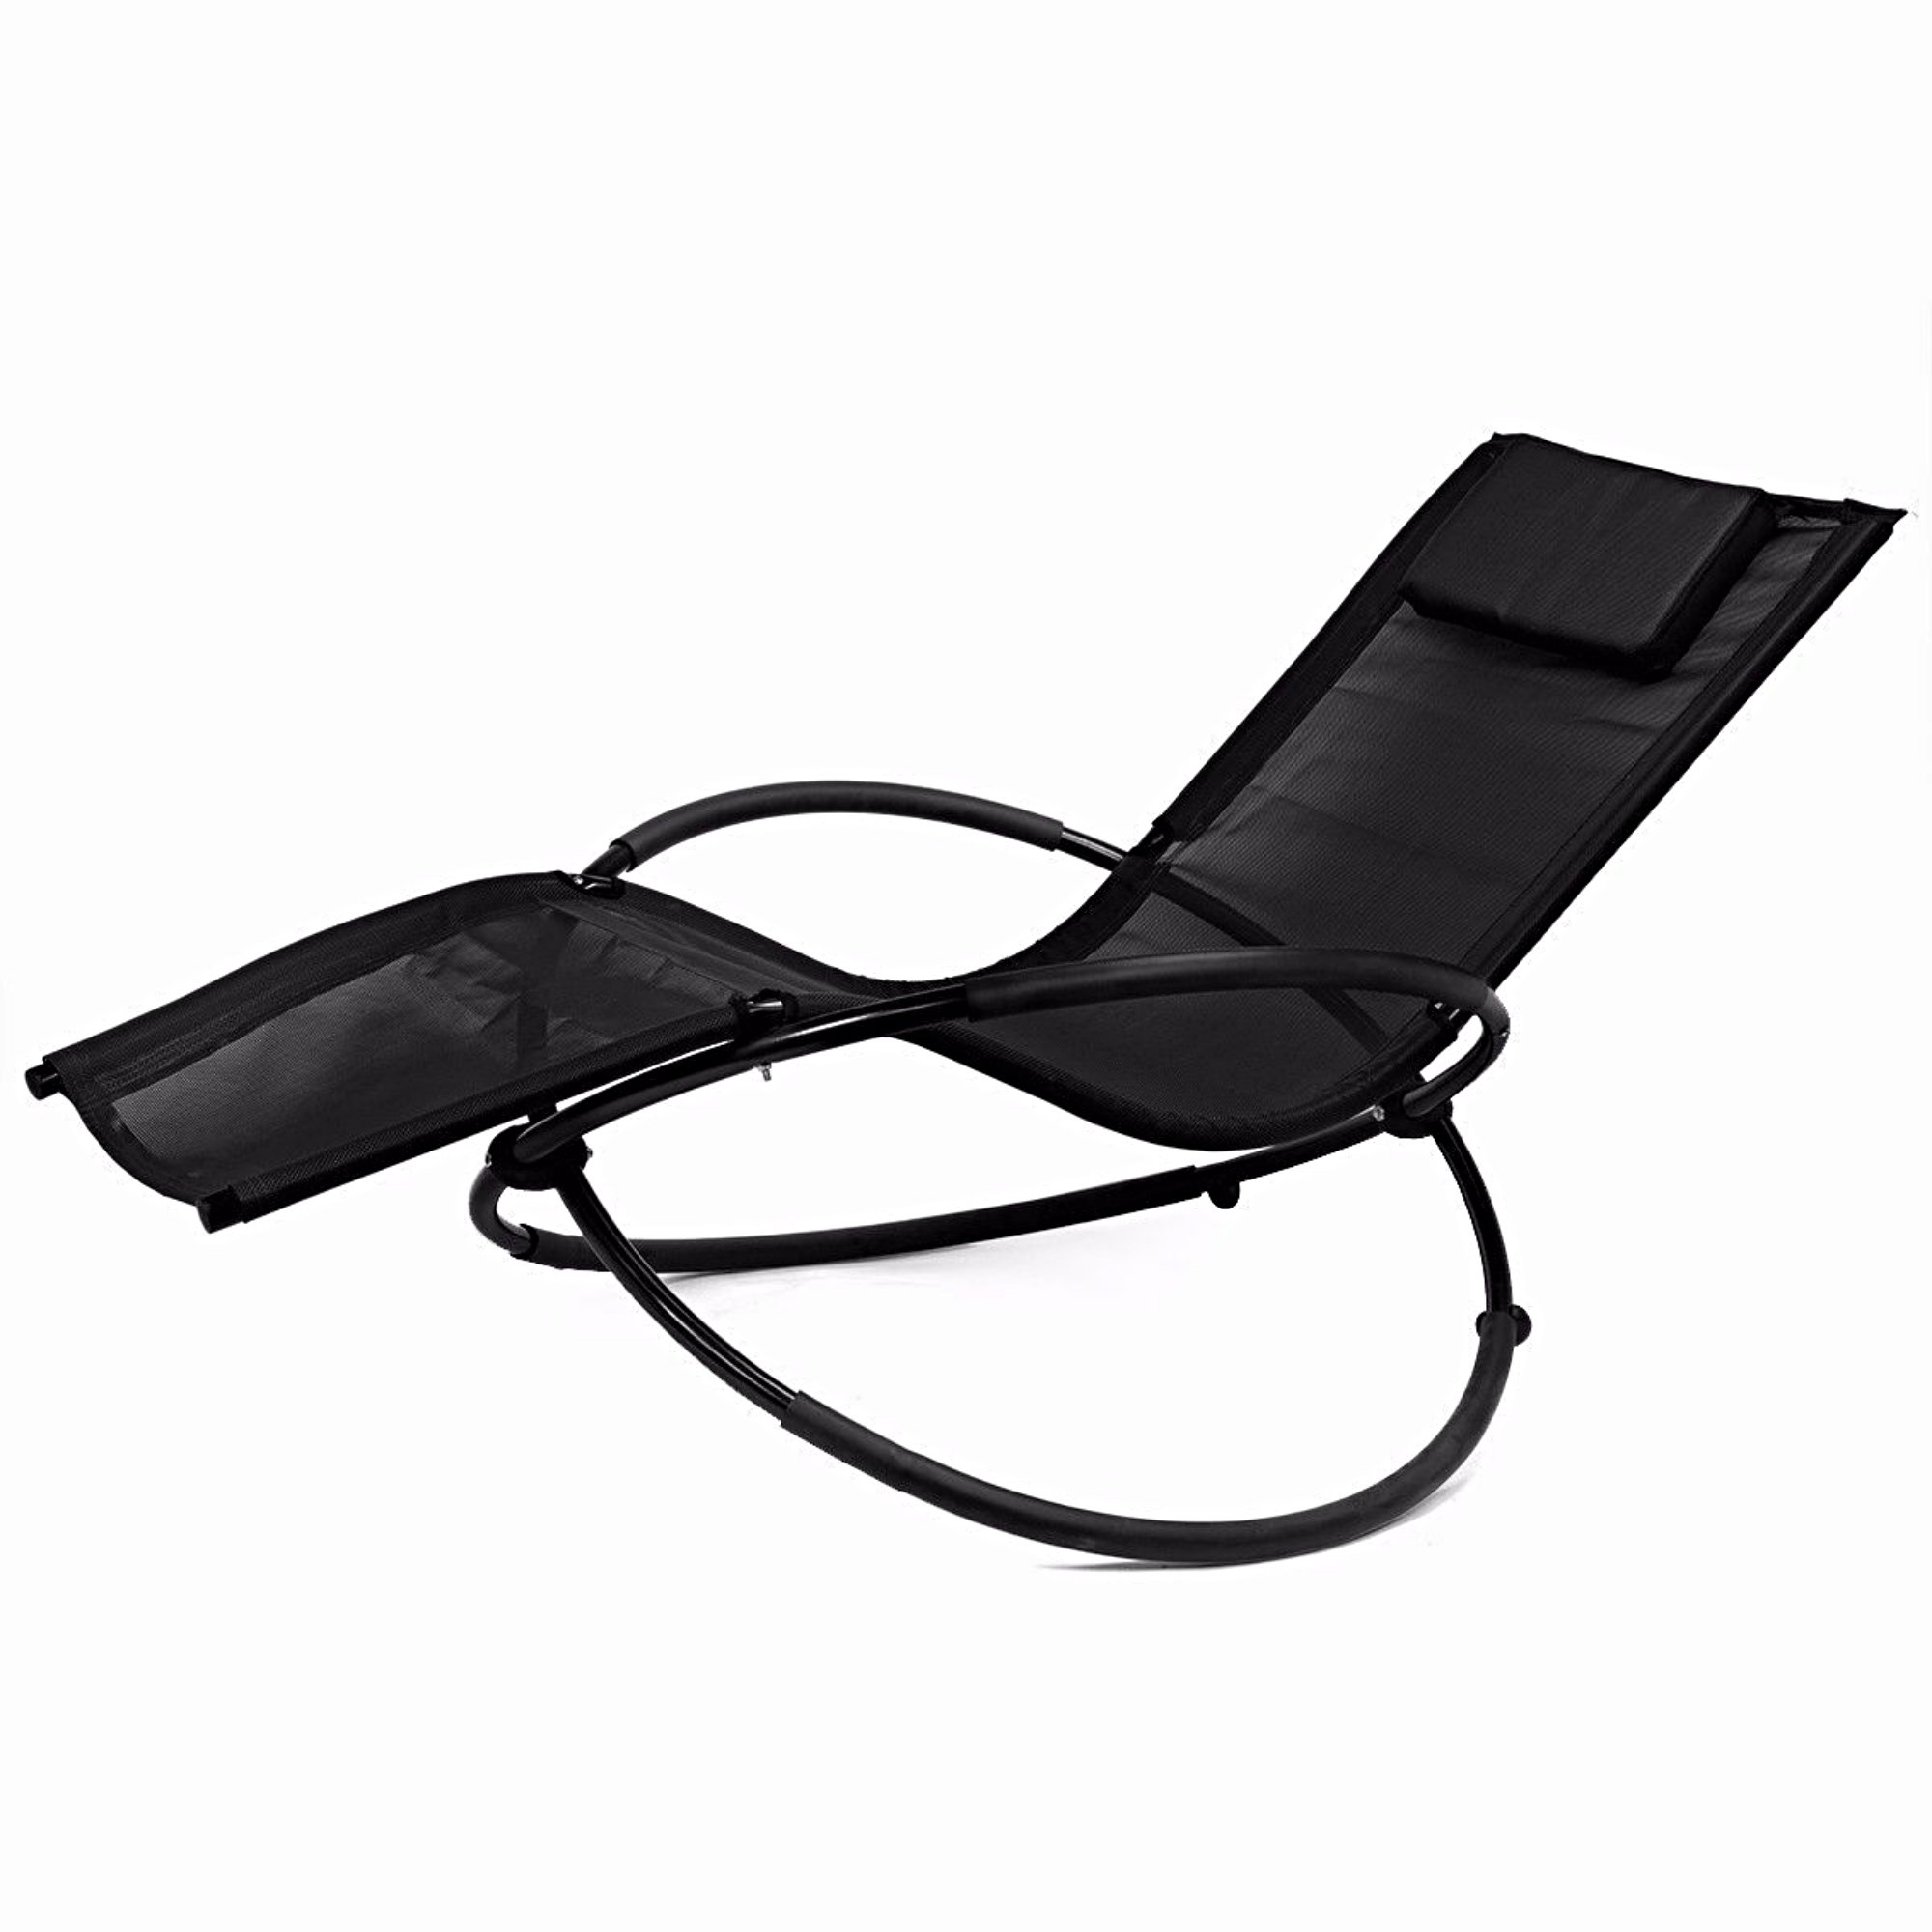 Zero Gravity Folding Orbit Chair Patio Lounger Reclining Rocking Relax Outdoor Black #230